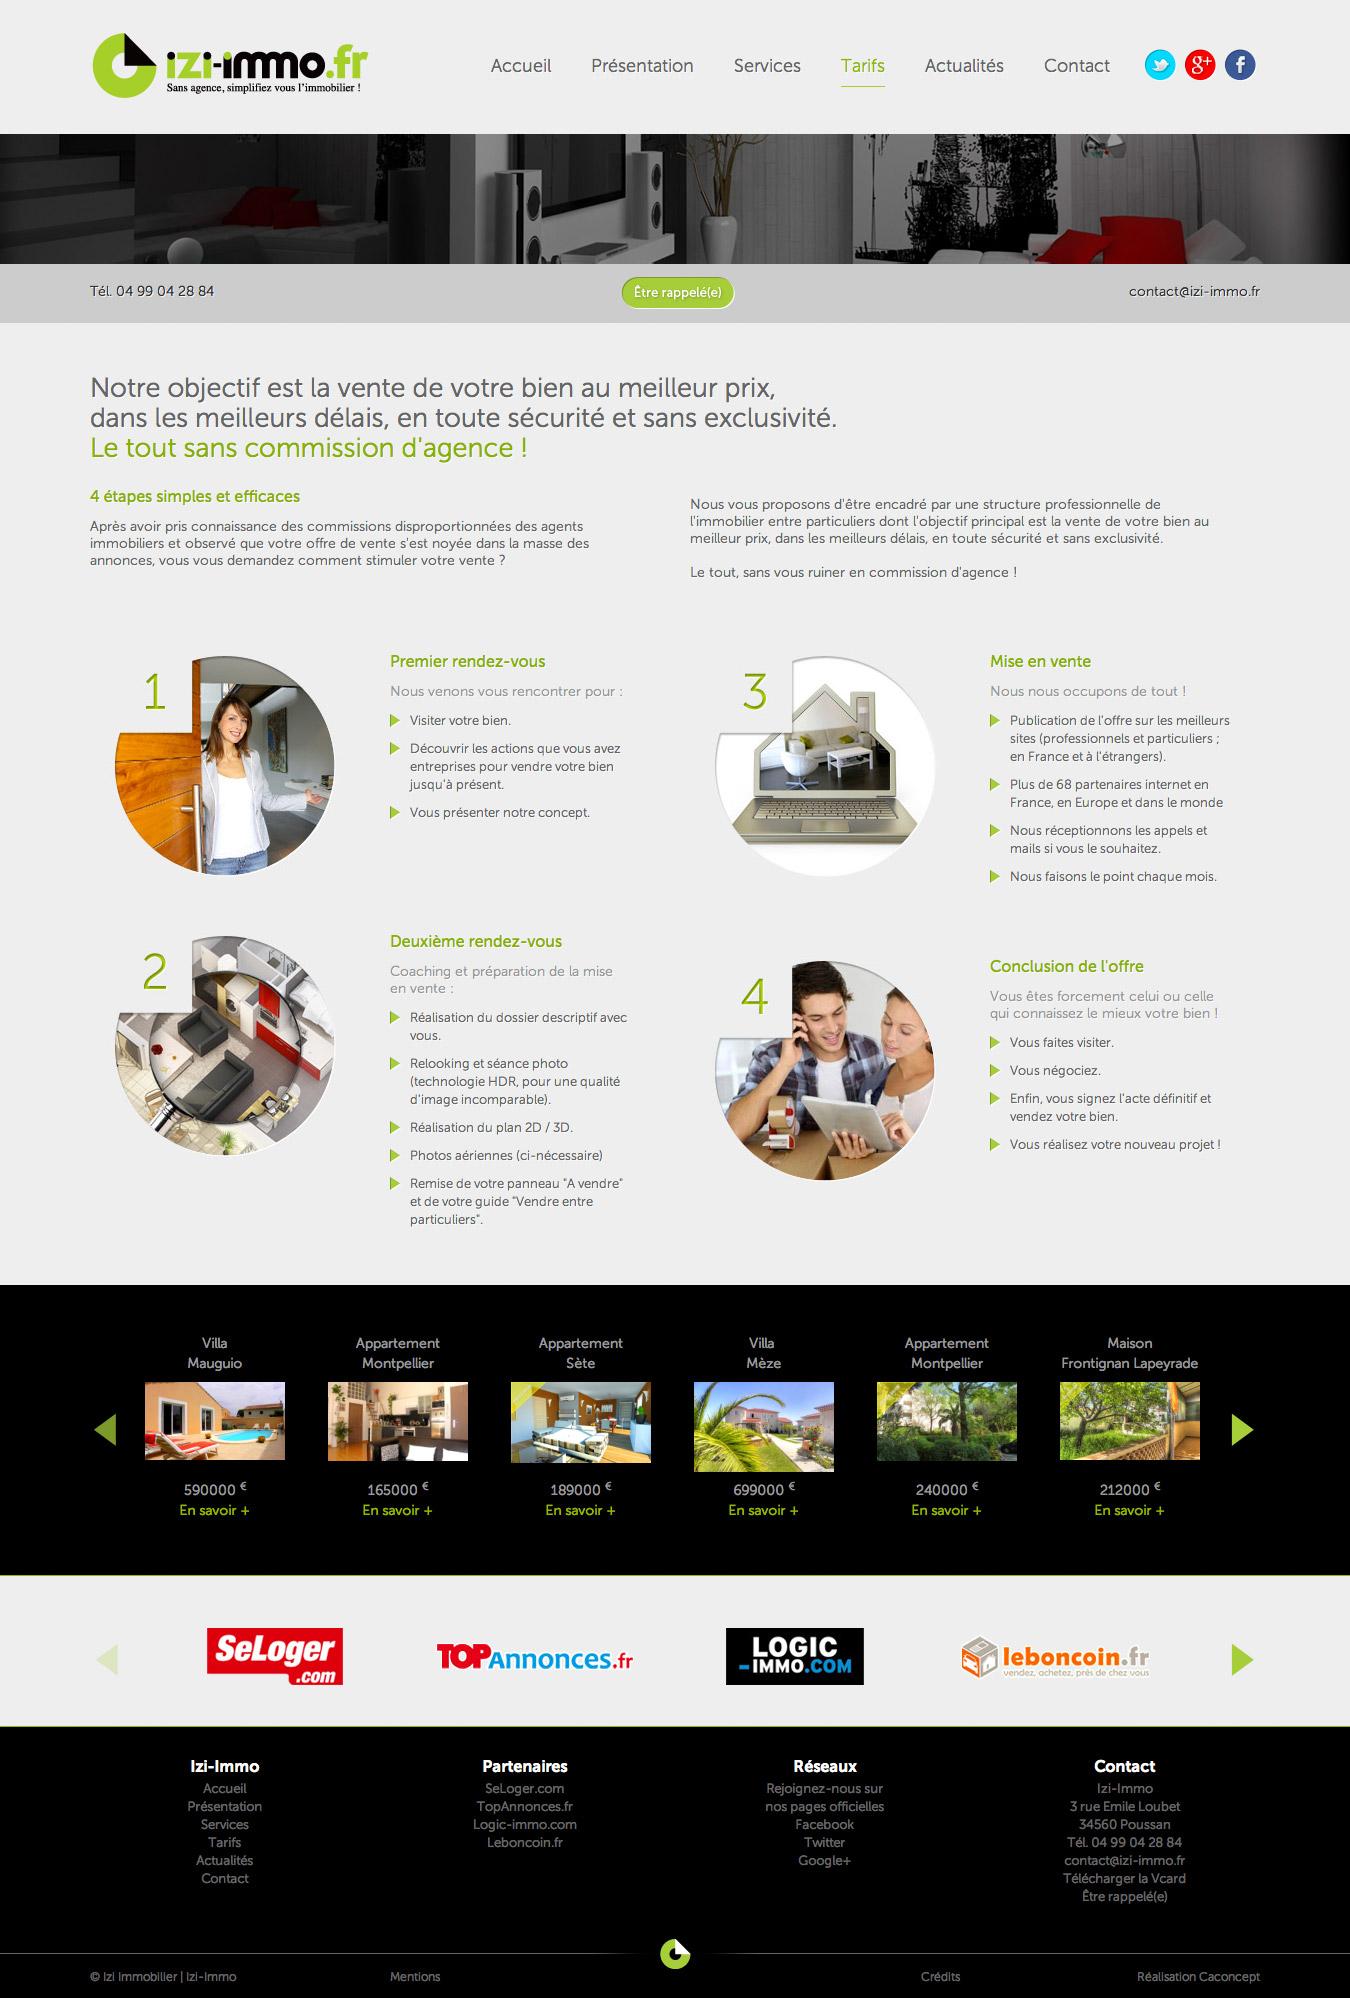 izi-immobilier-site-internet-prestations-creation-communication-caconcept-alexis-cretin-graphiste